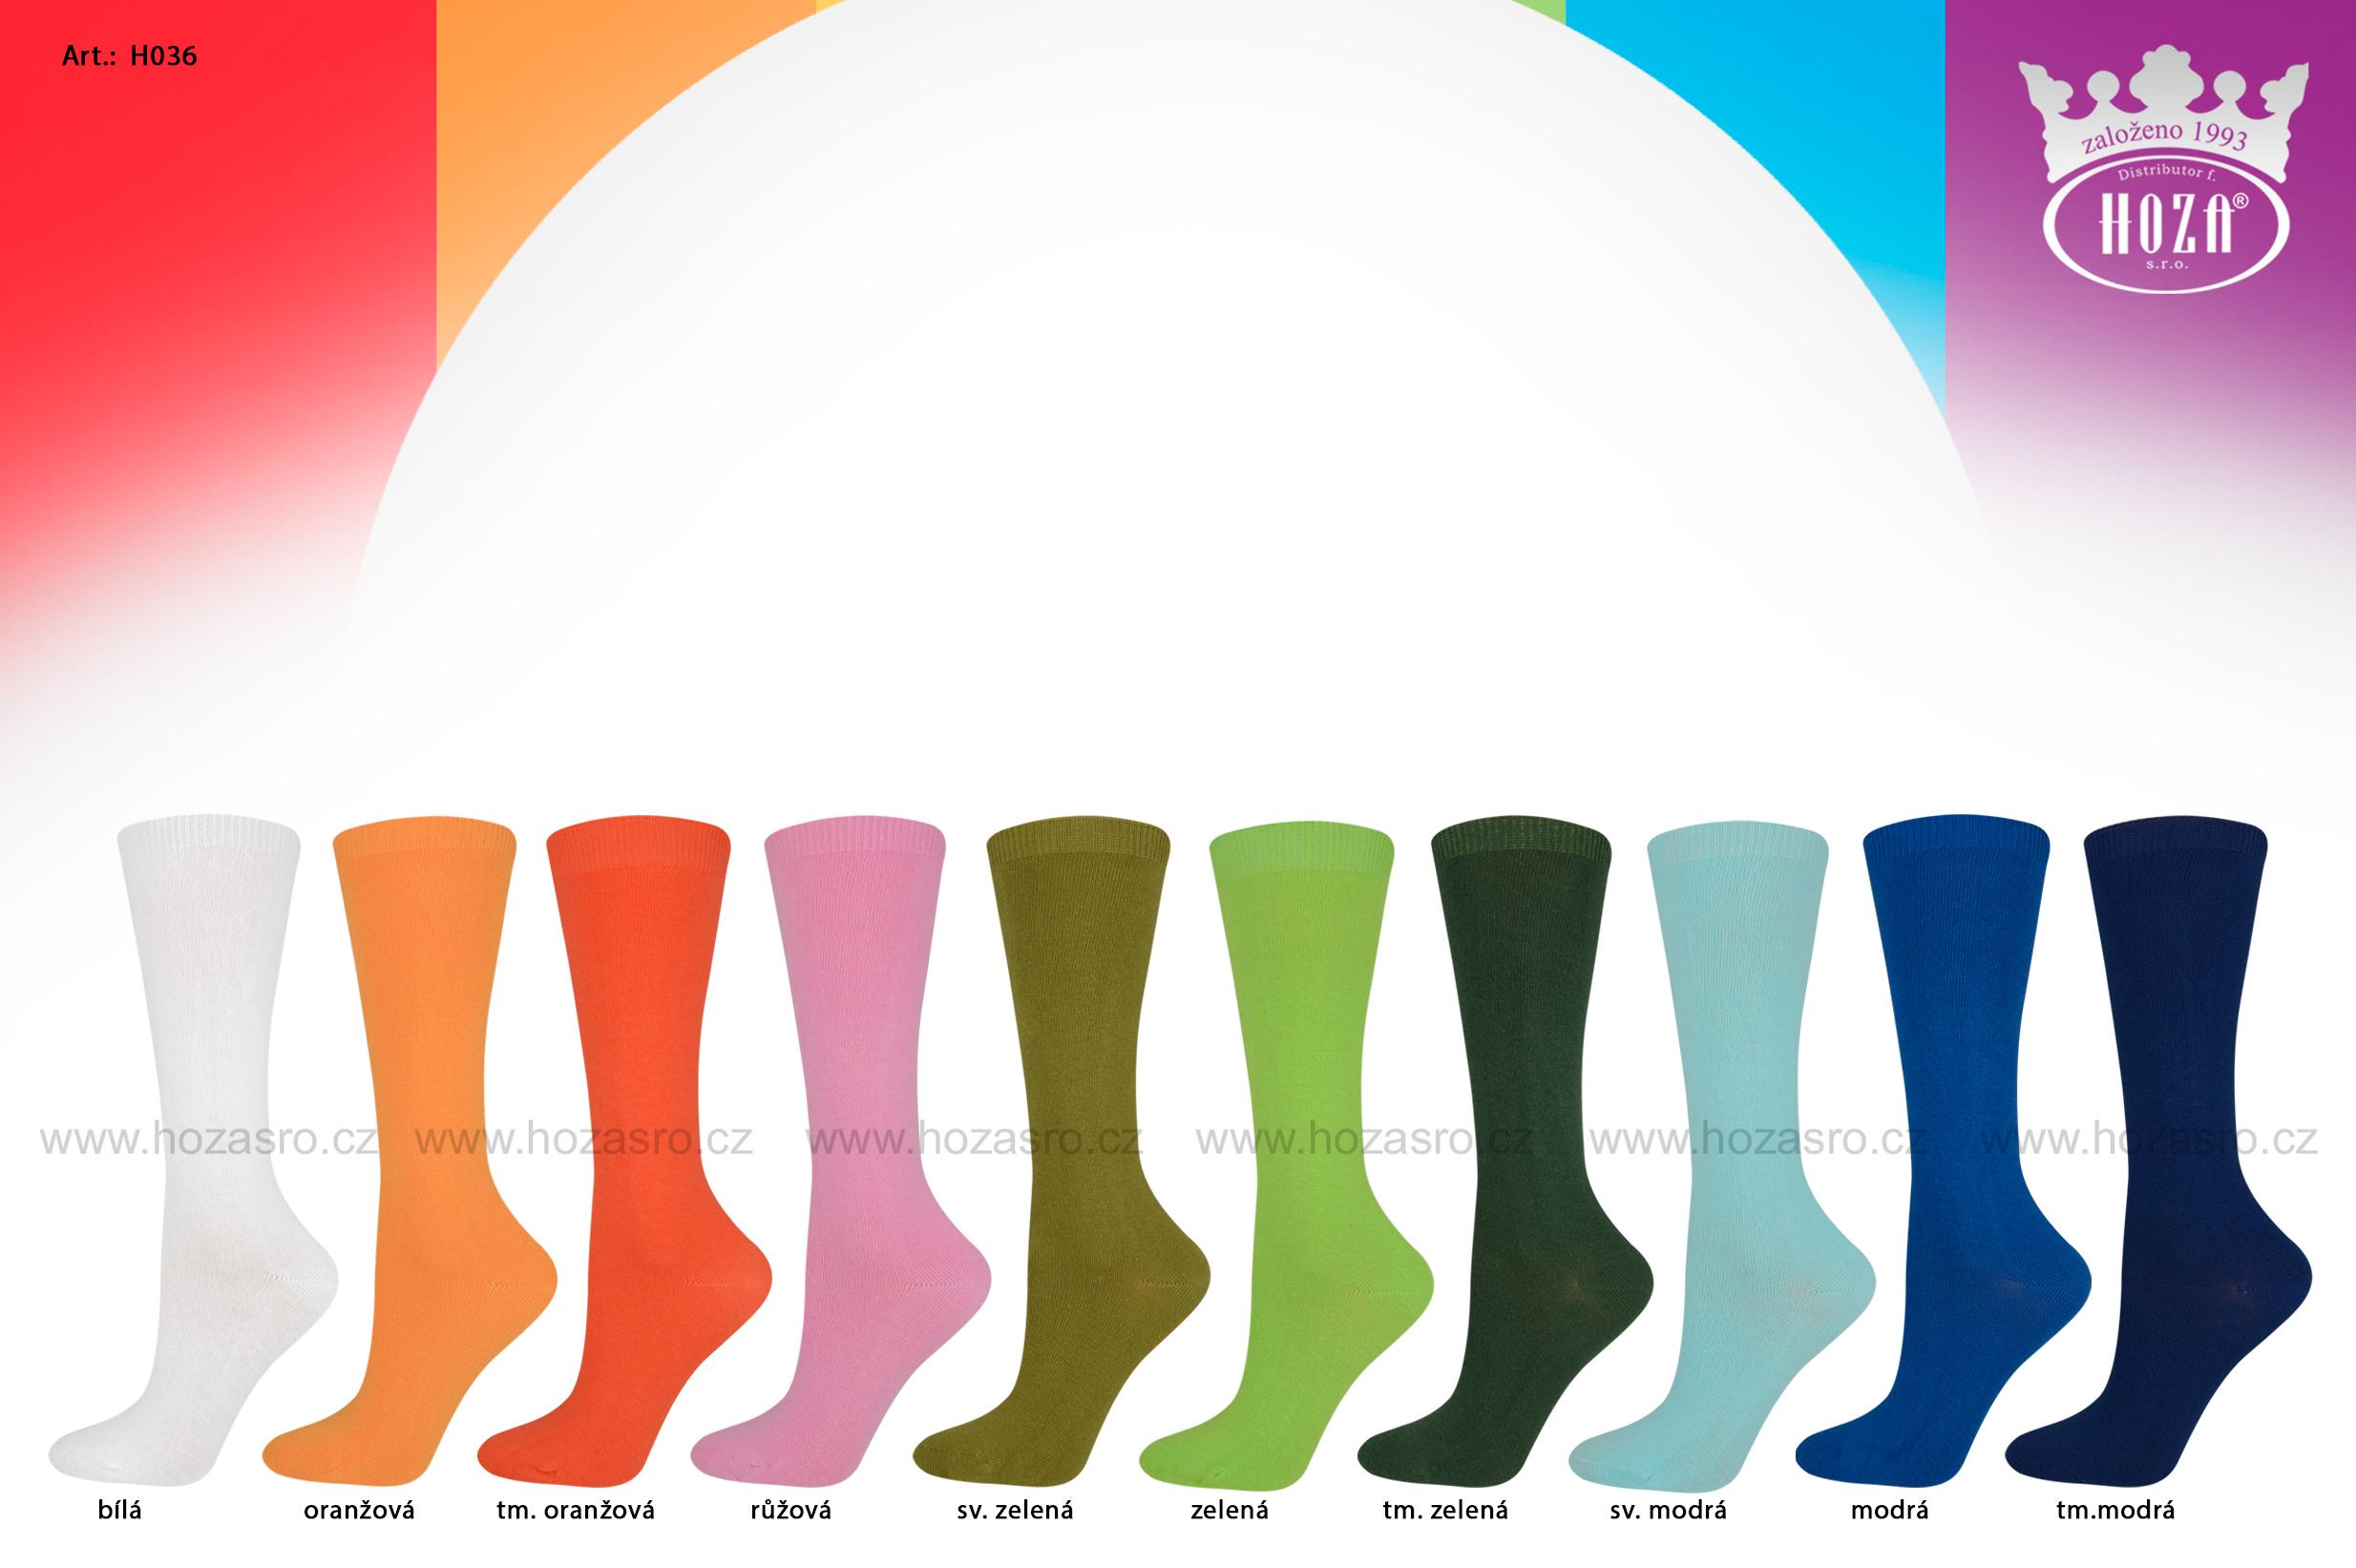 katalog tmb h036 barevna-kombinace.jpg 65512ef9f1